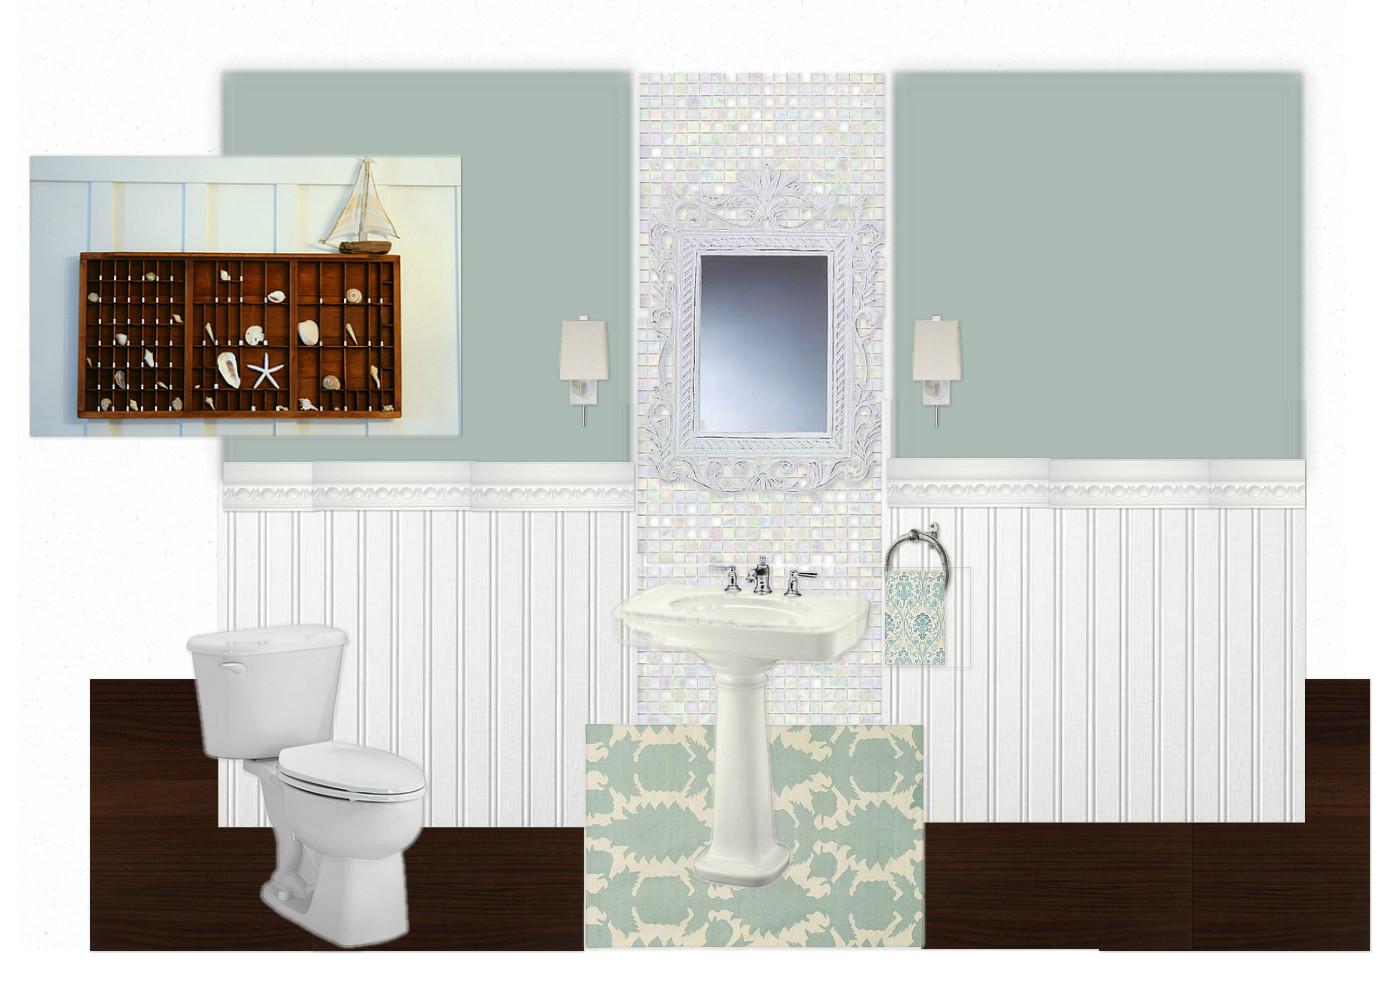 Bathroom half tiled half painted - Half Bath Update Home Stories A To Z